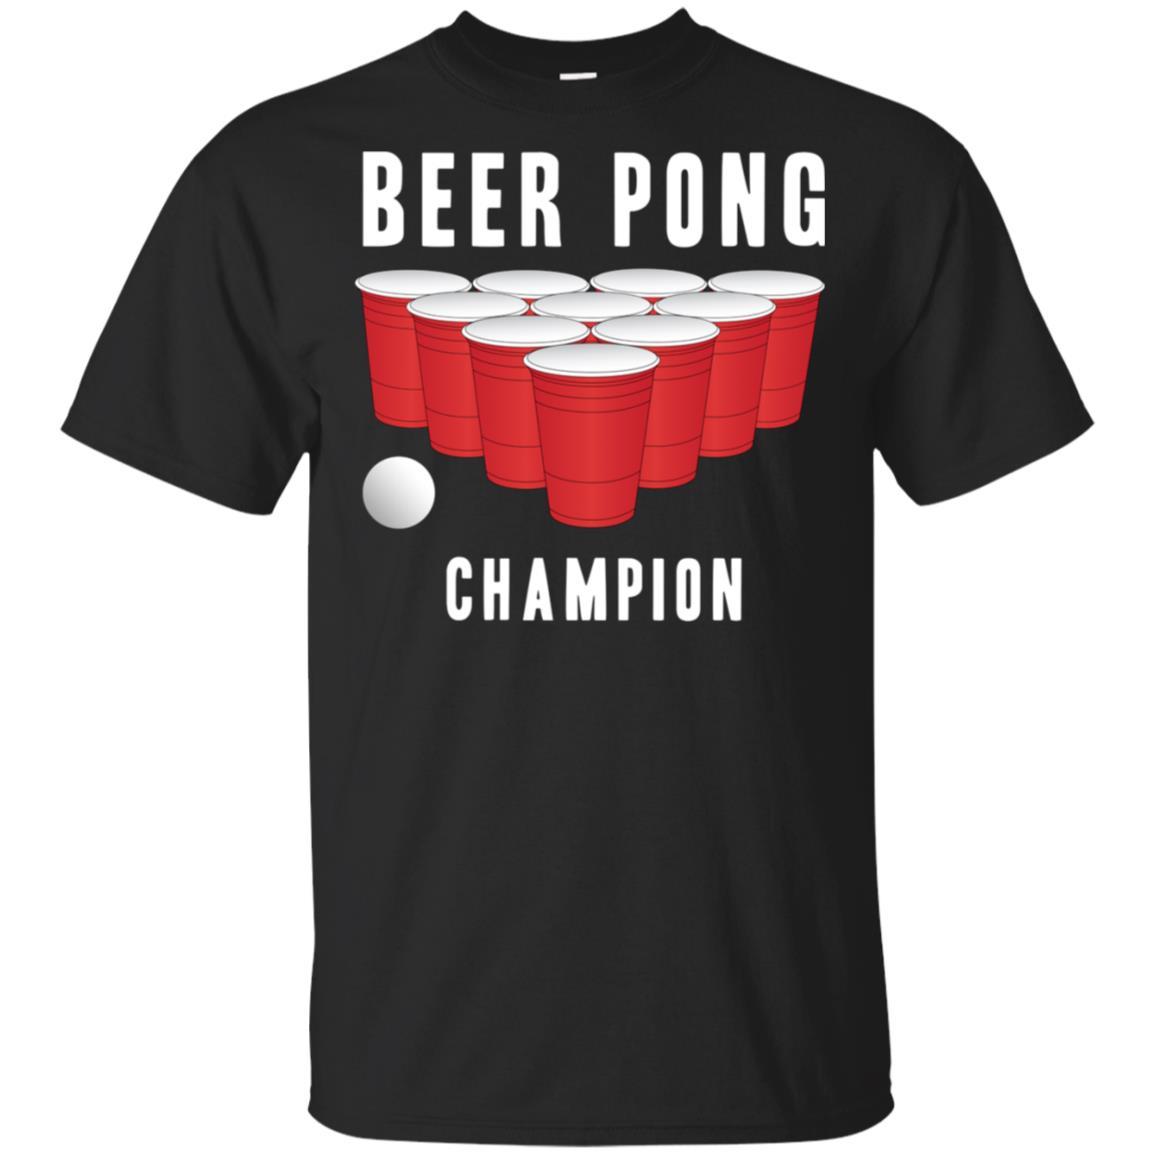 Beer Pong Champion Party Tee Alcohol Men Women Unisex Short Sleeve